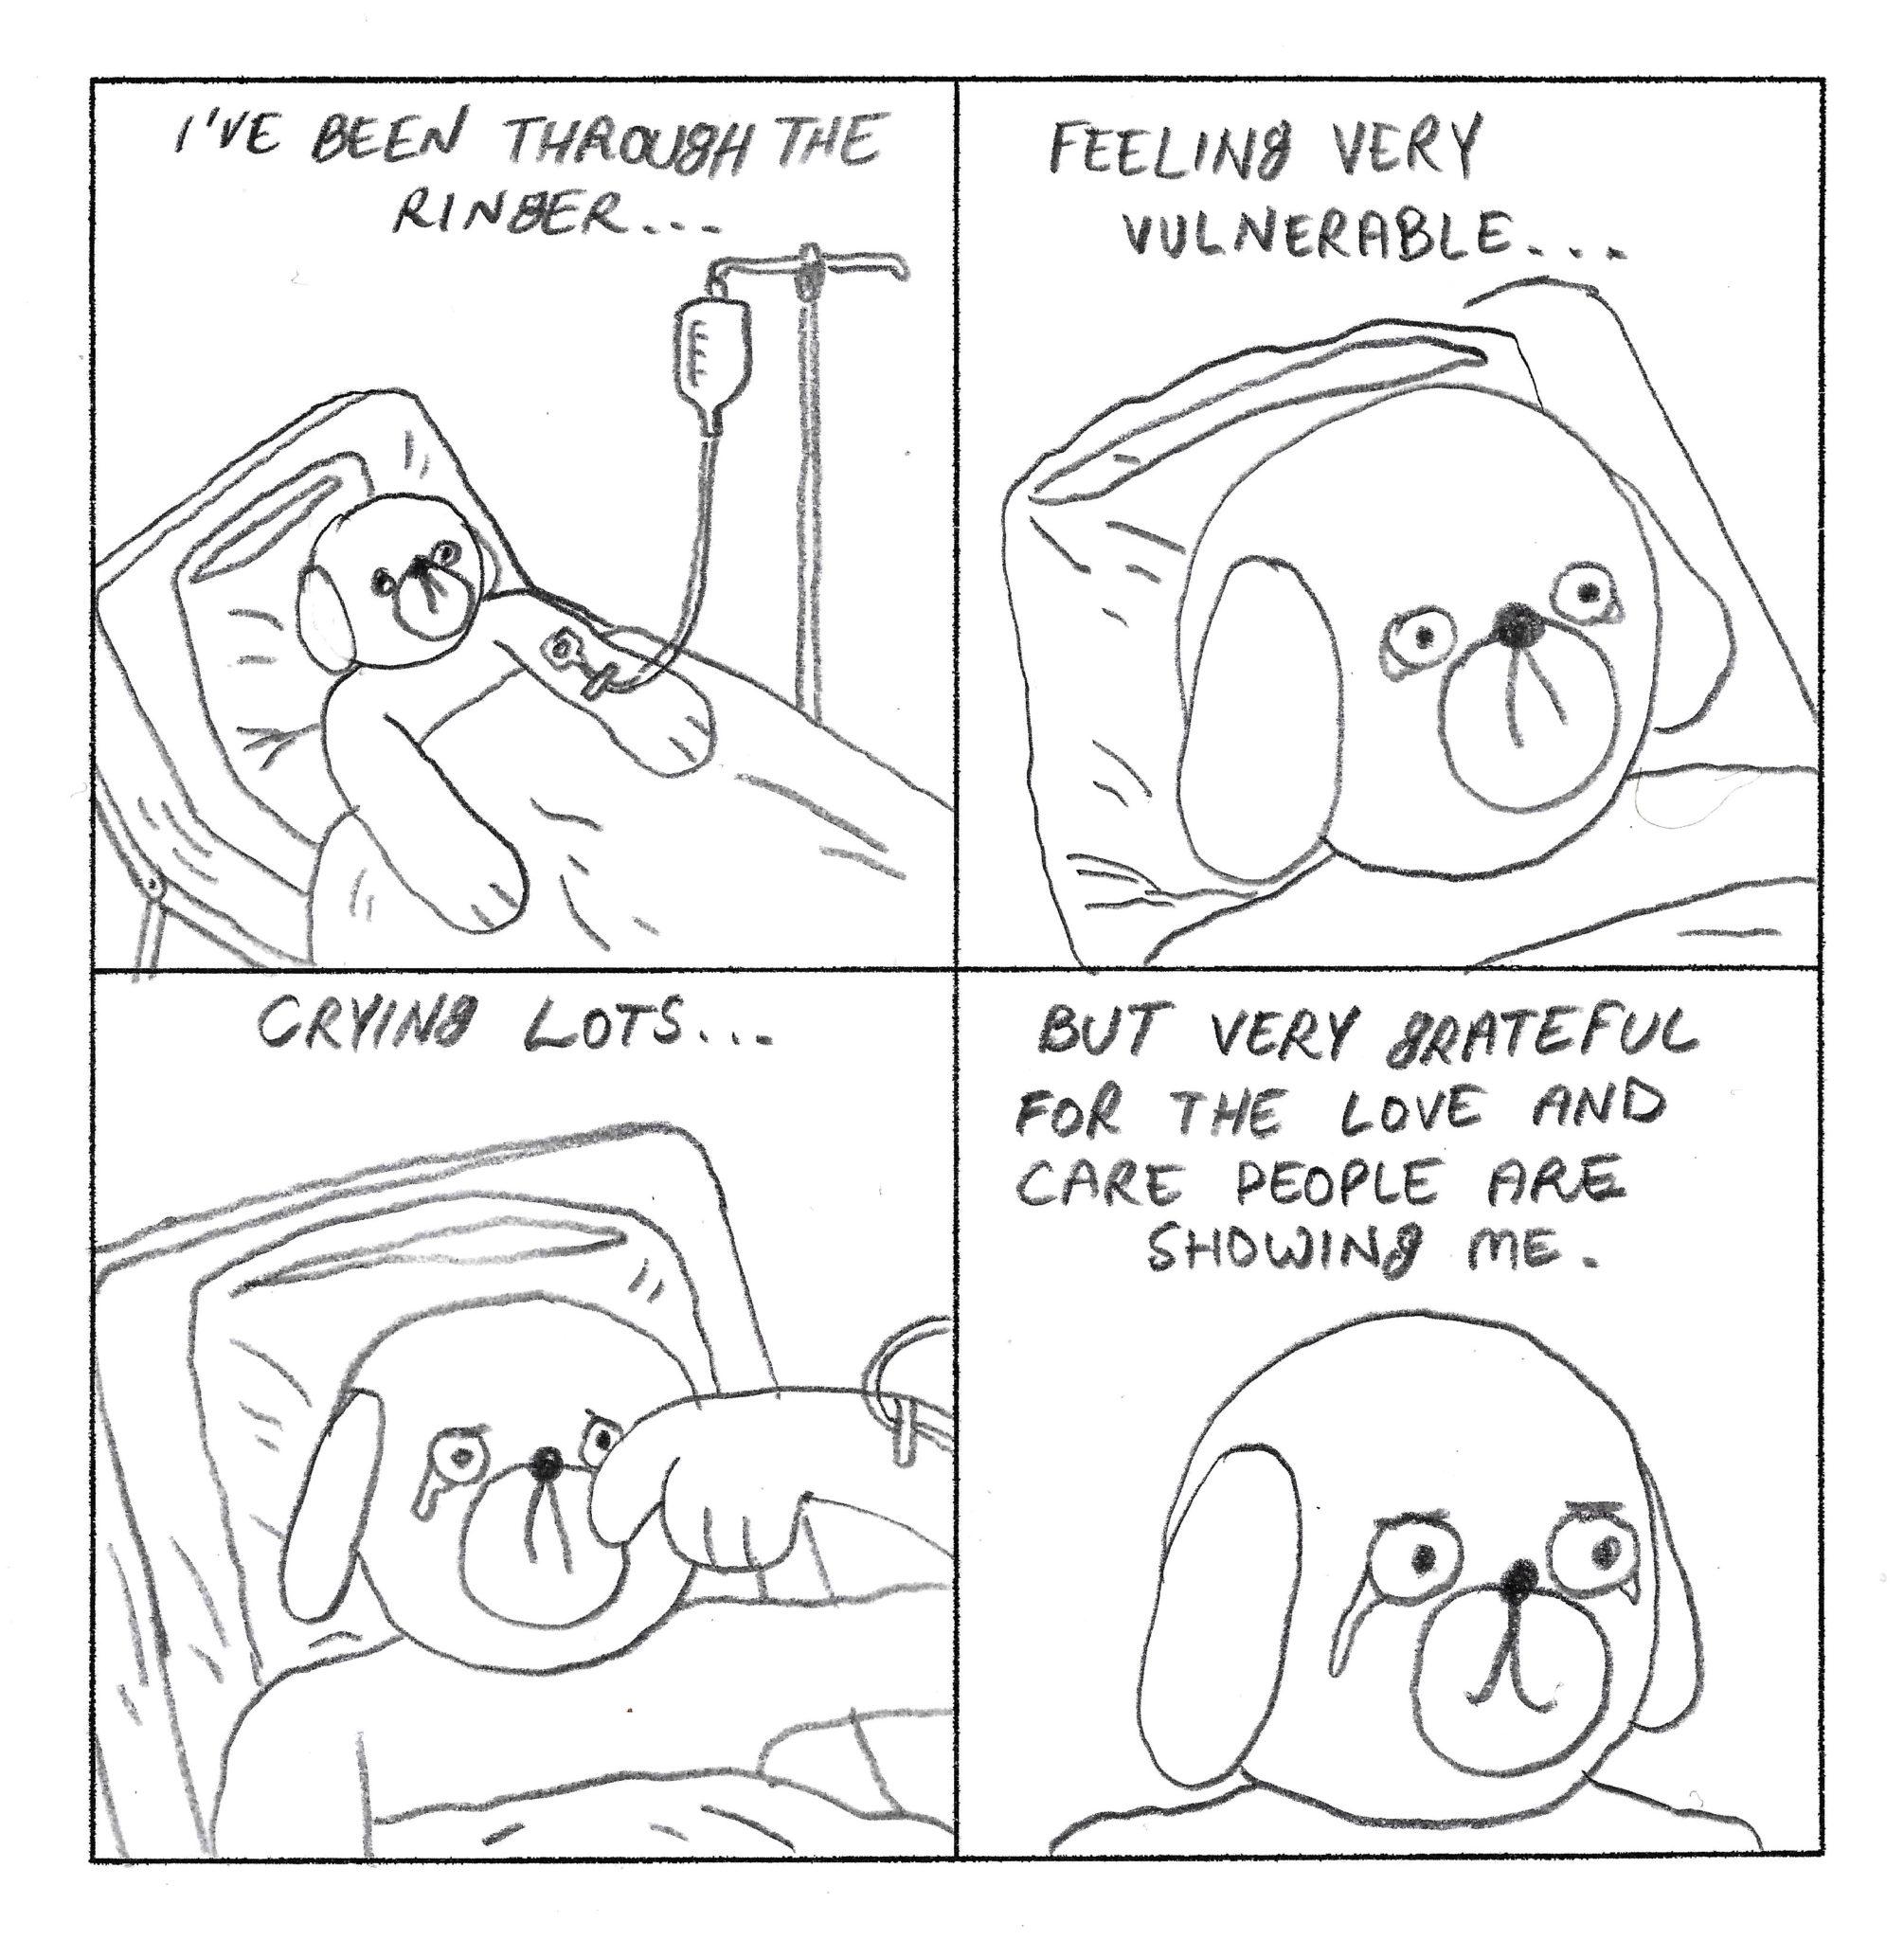 Dog Comics 101-110 - Page 1